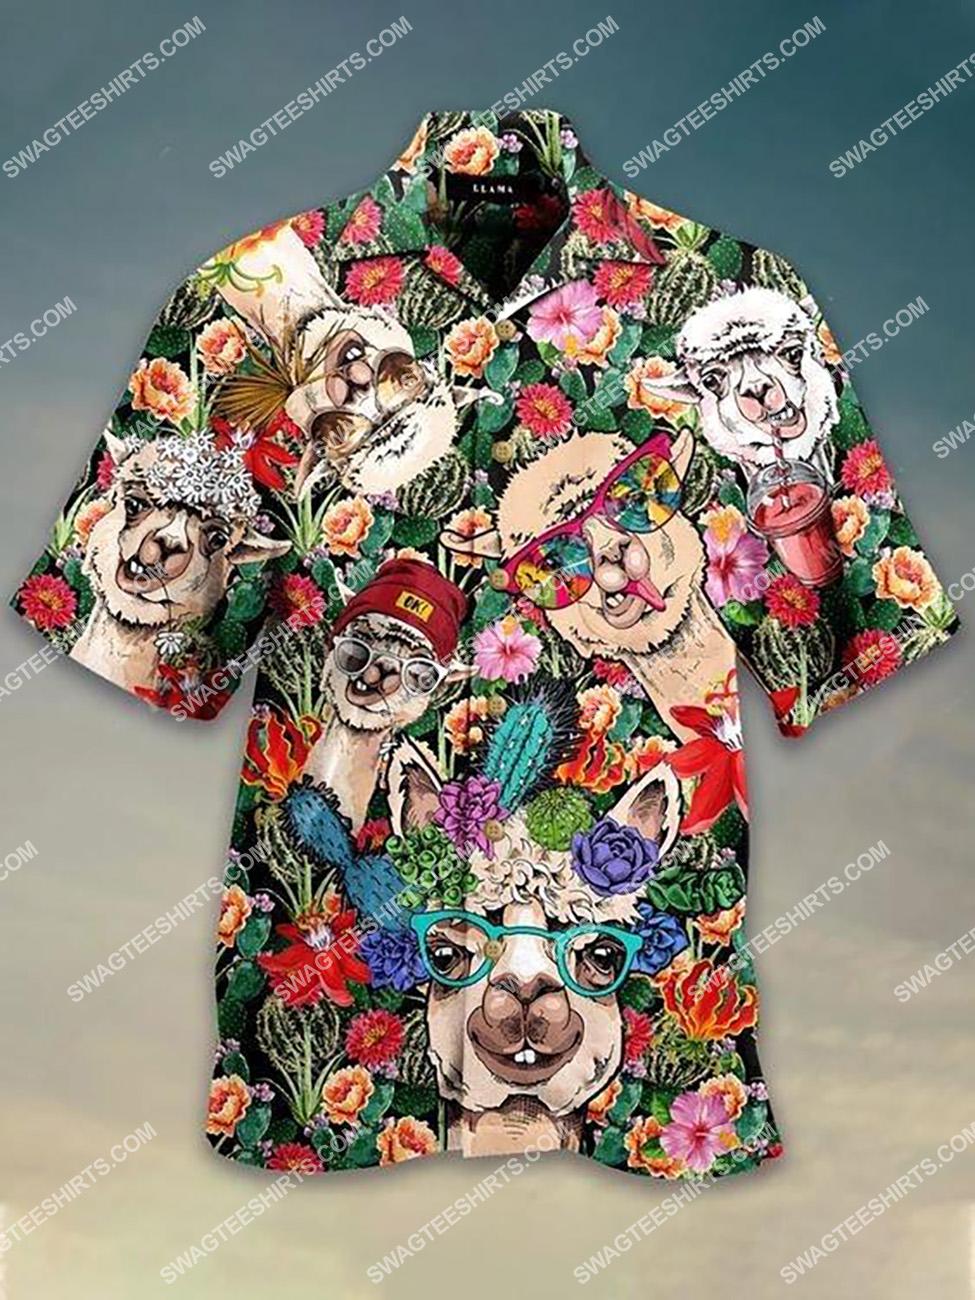 the tropical llama lover all over printed hawaiian shirt 1(1)